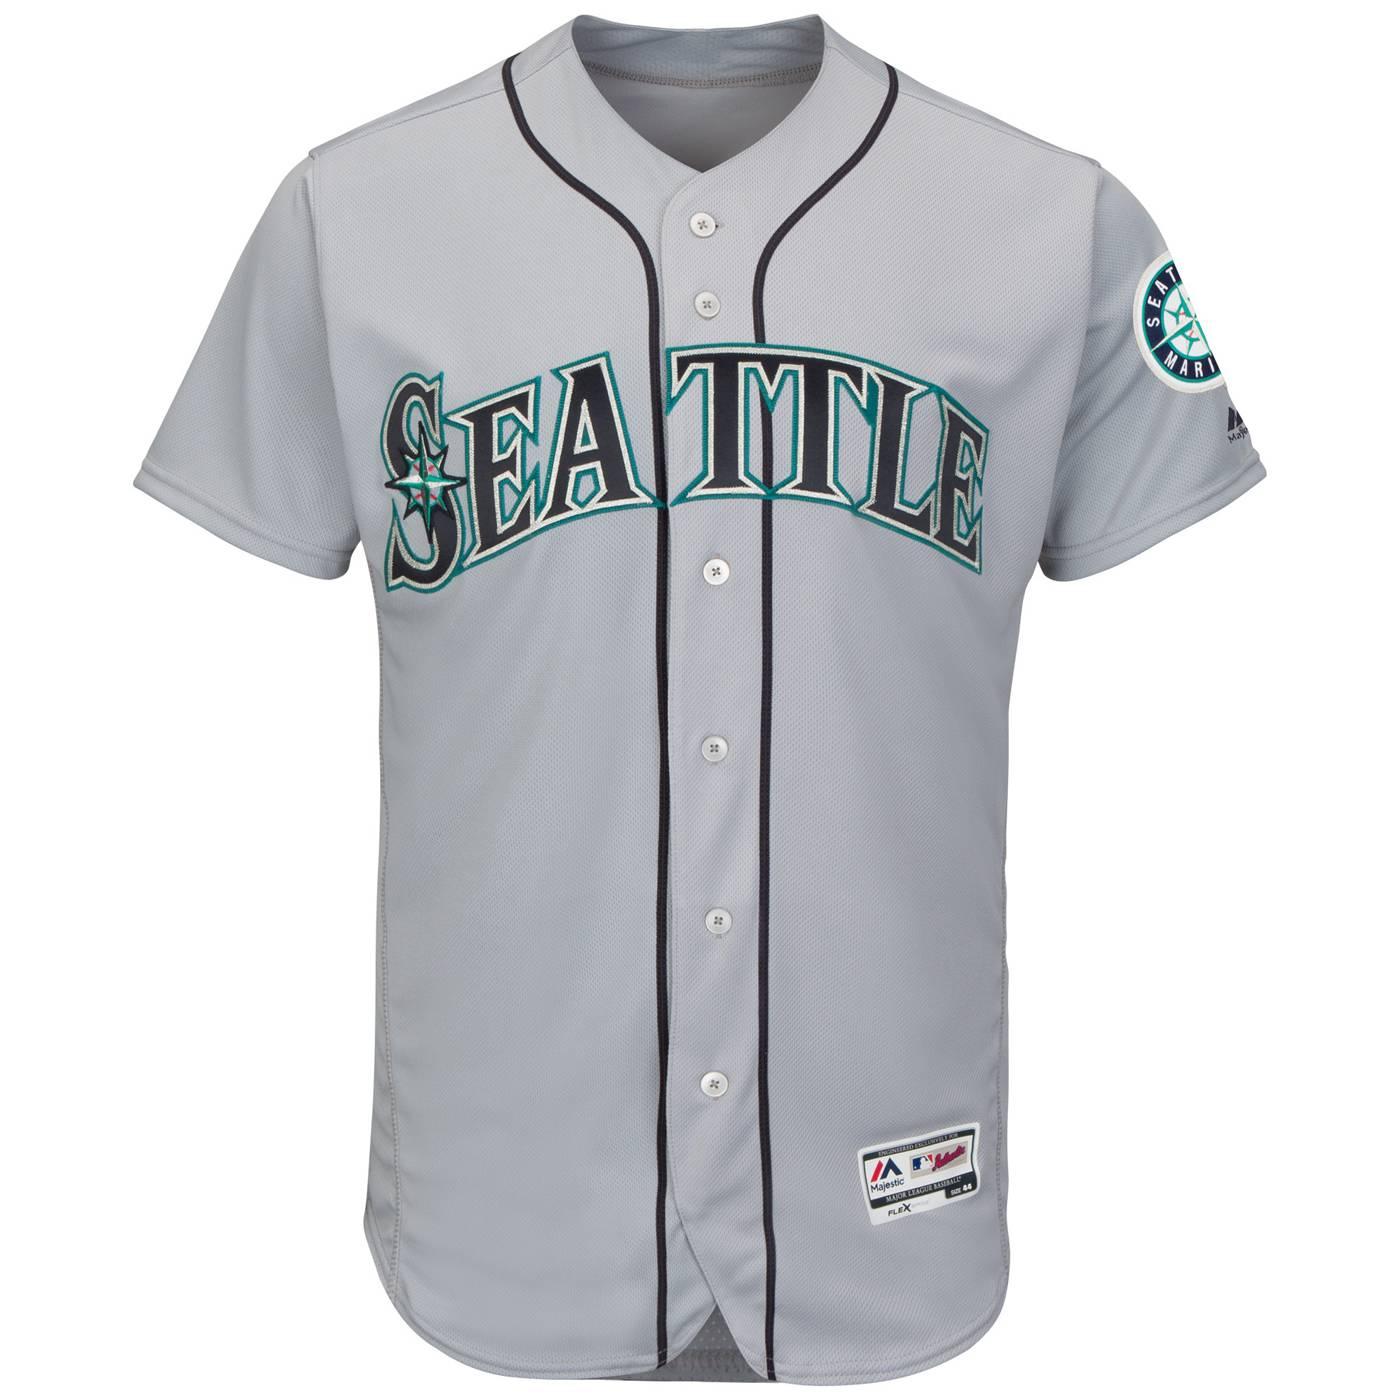 buy popular e0537 ceaae inexpensive seattle mariners baseball jersey bdbf7 803d0